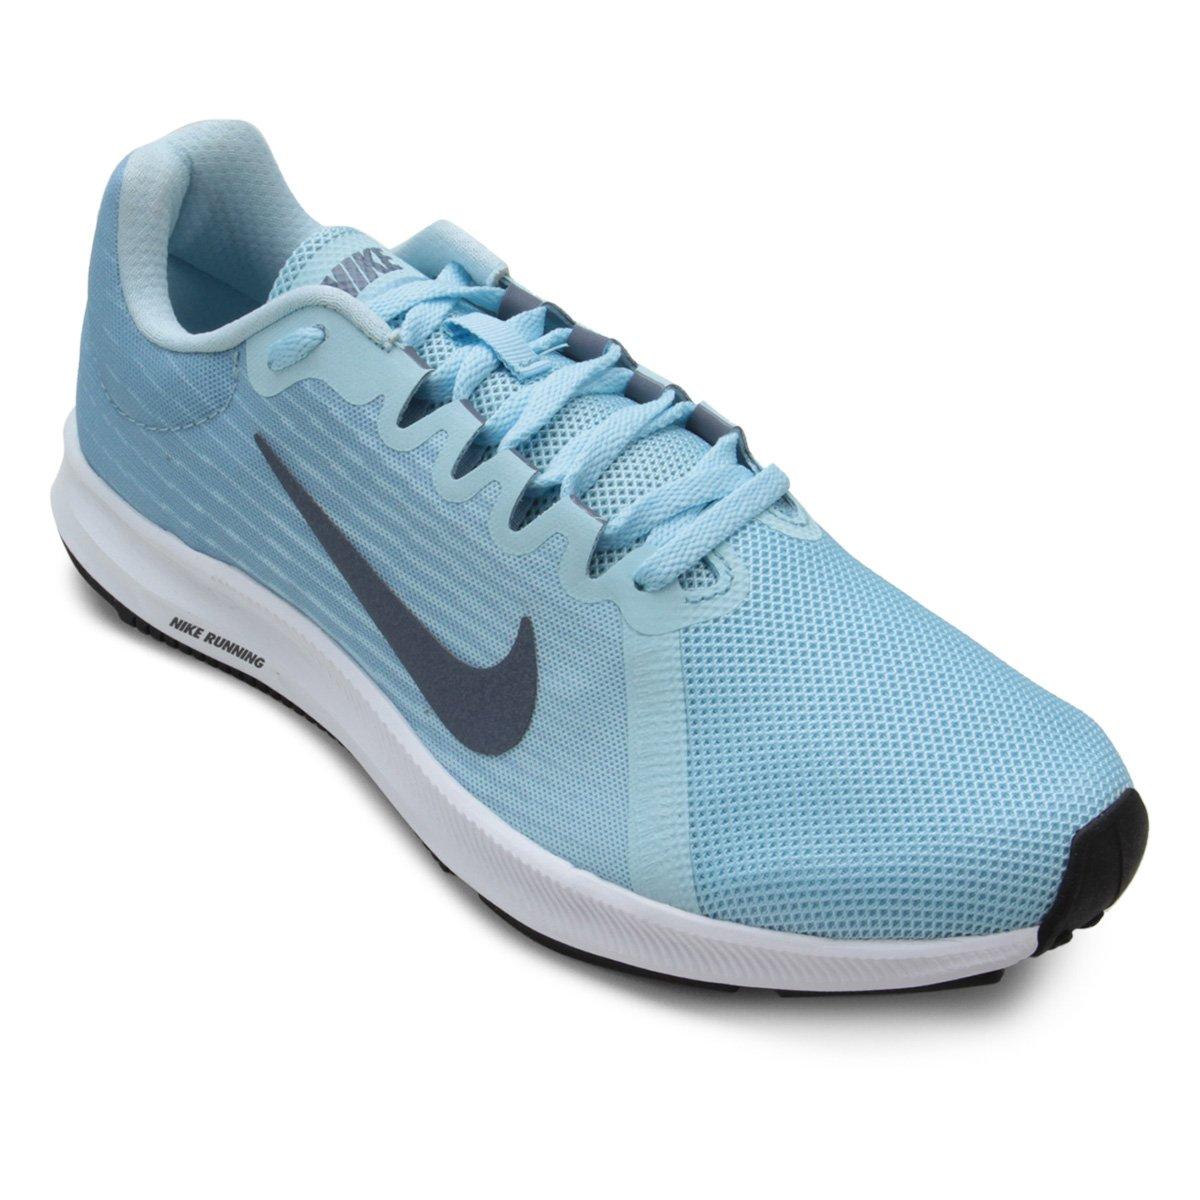 5c81a4aacf Tênis Nike Wmns Downshifter 8 Feminino - Azul Claro - Compre Agora ...